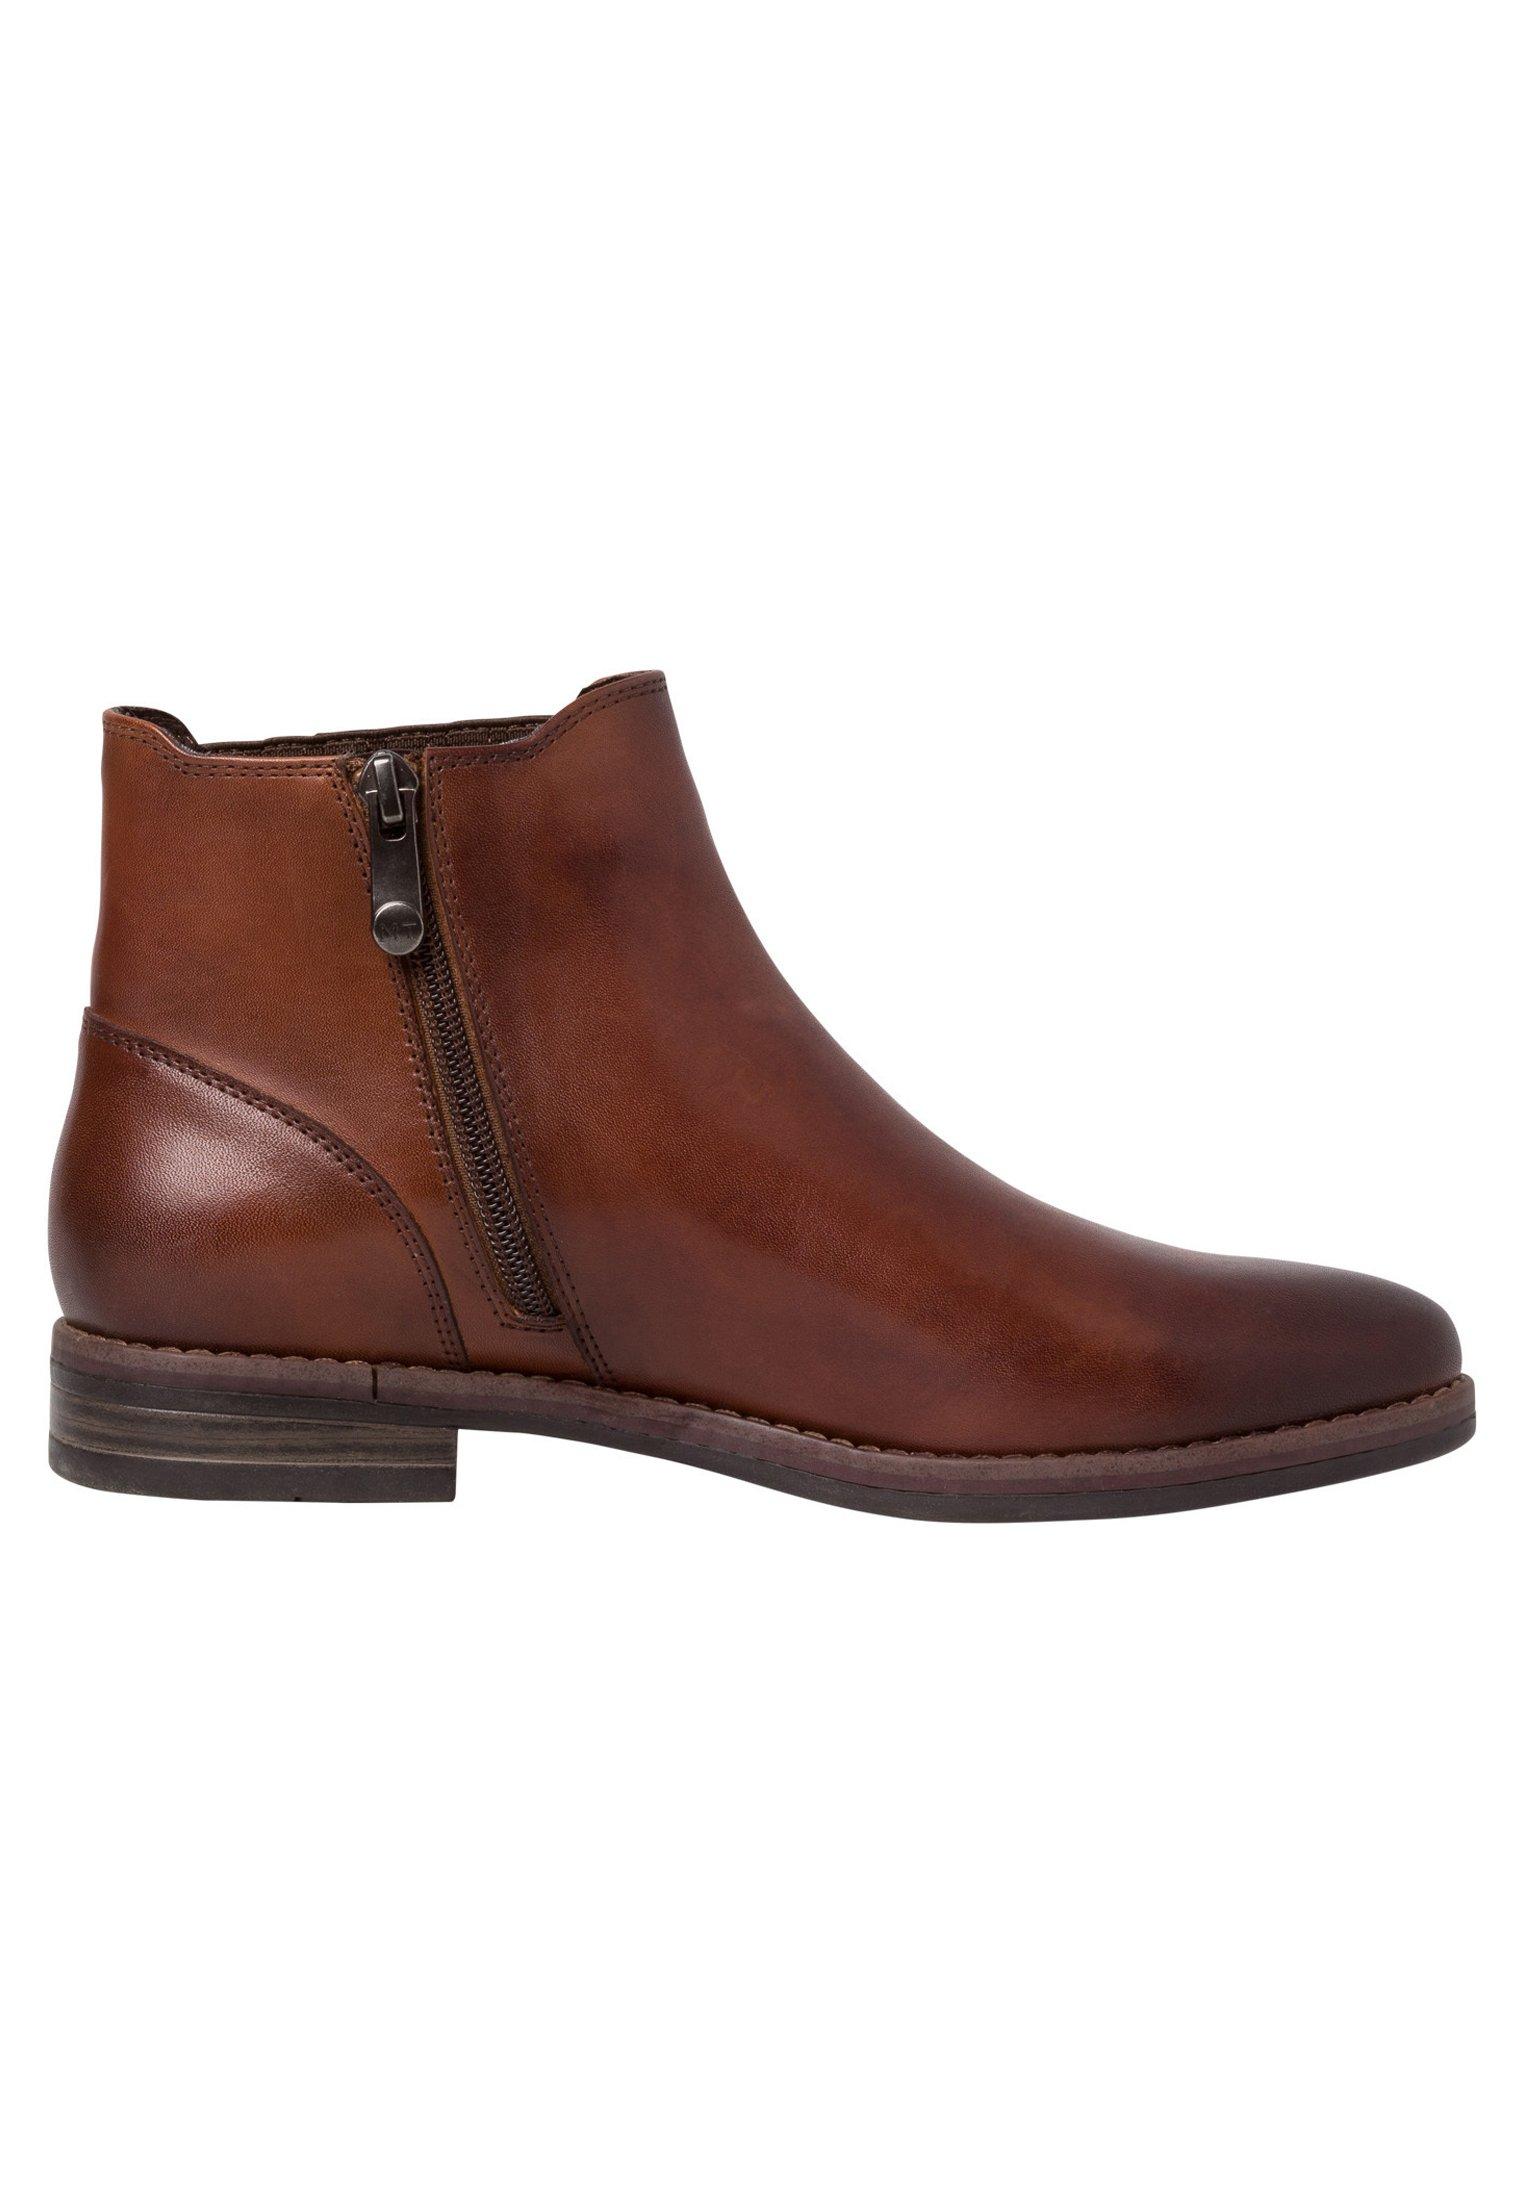 Marco Tozzi CHELSEA BOOT - Nilkkurit - cognac ant.com - Naisten kengät vDOIl